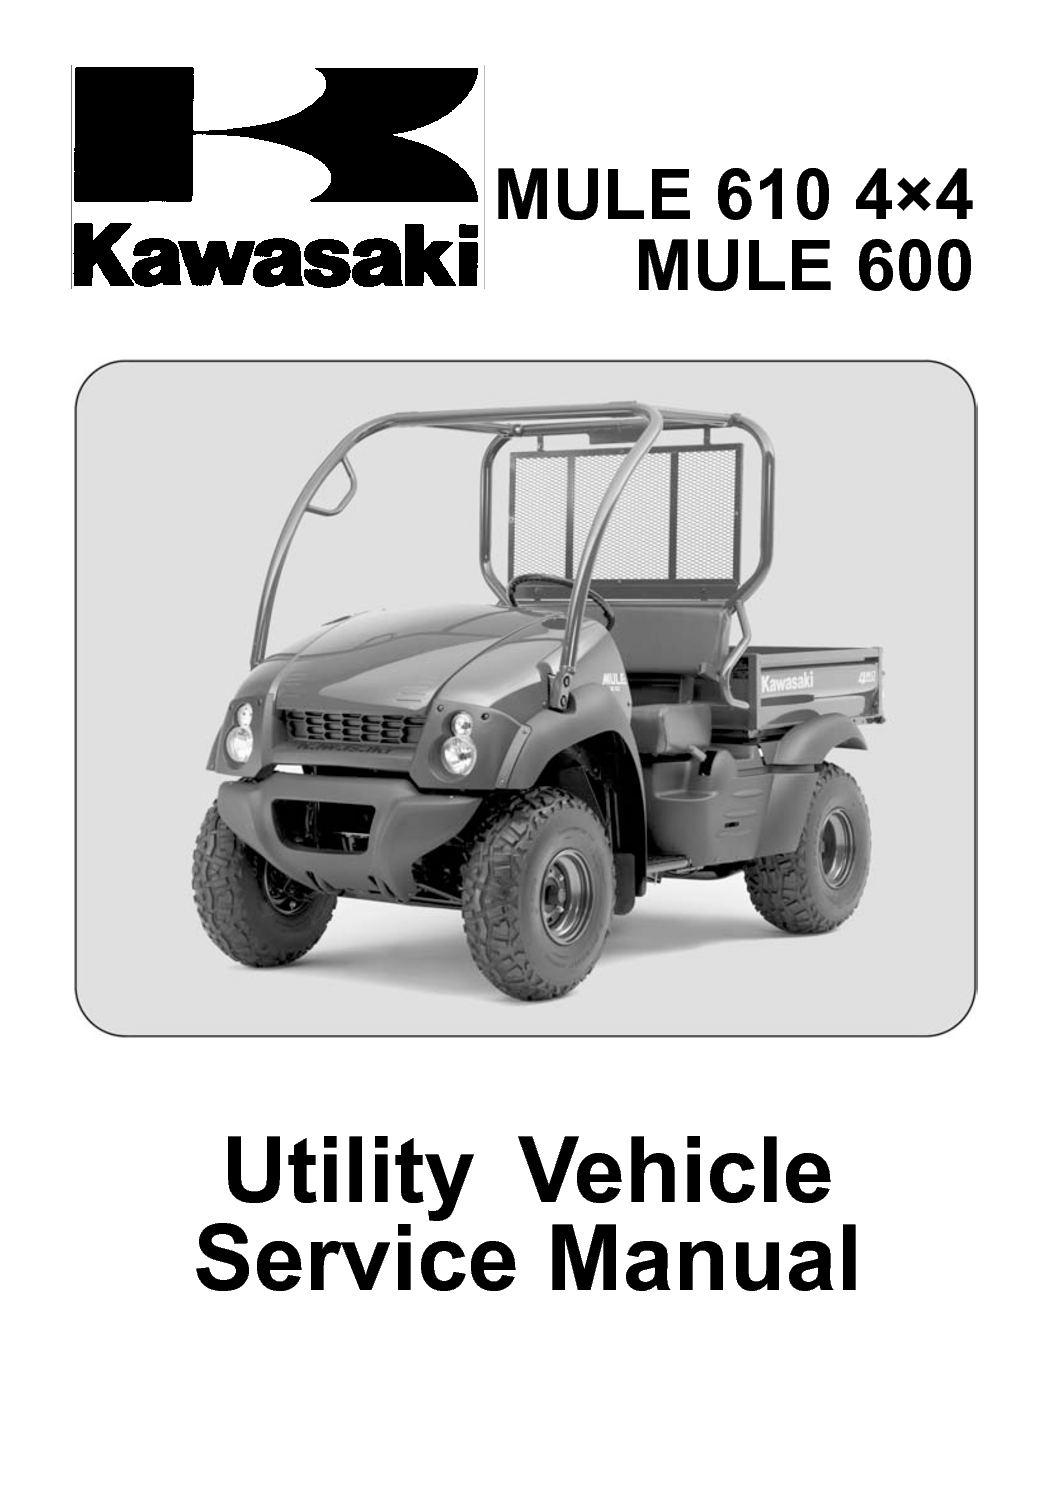 Calam O 2005 KAWASAKI MULE 610 4 4 MULE 600 Service Repair